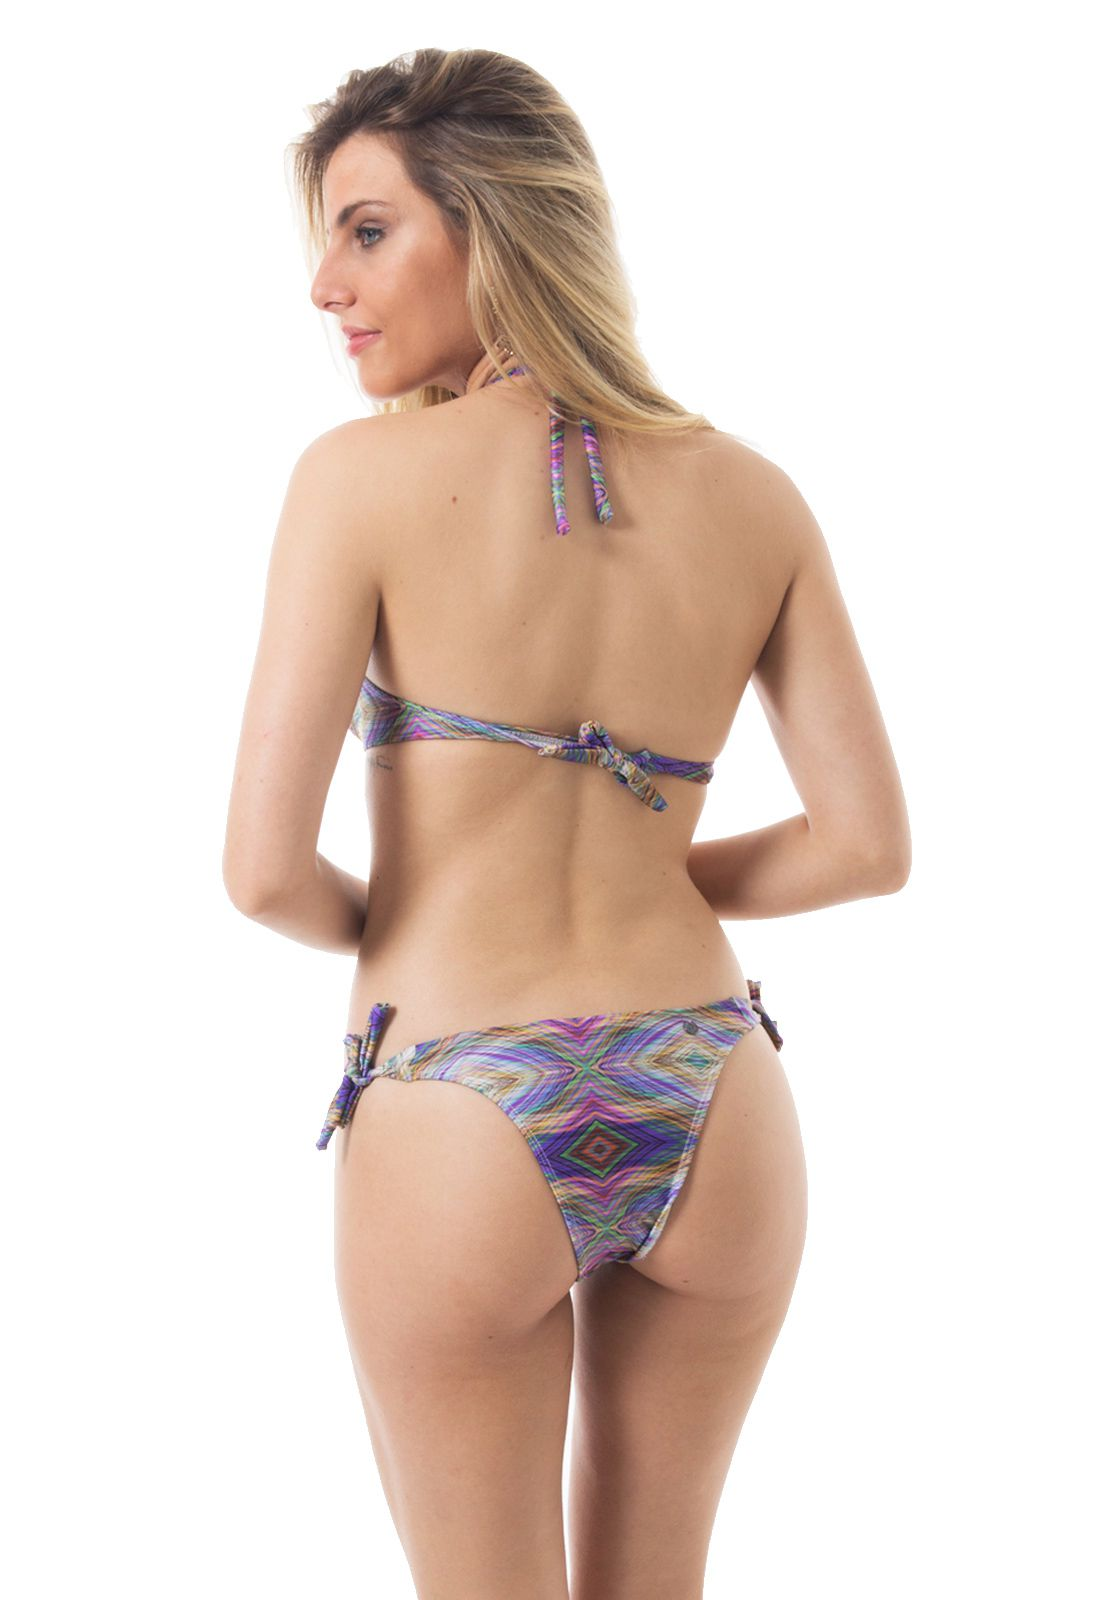 Biquíni Flavia Donadio Beachwear Sunset Conjunto Modelo 1